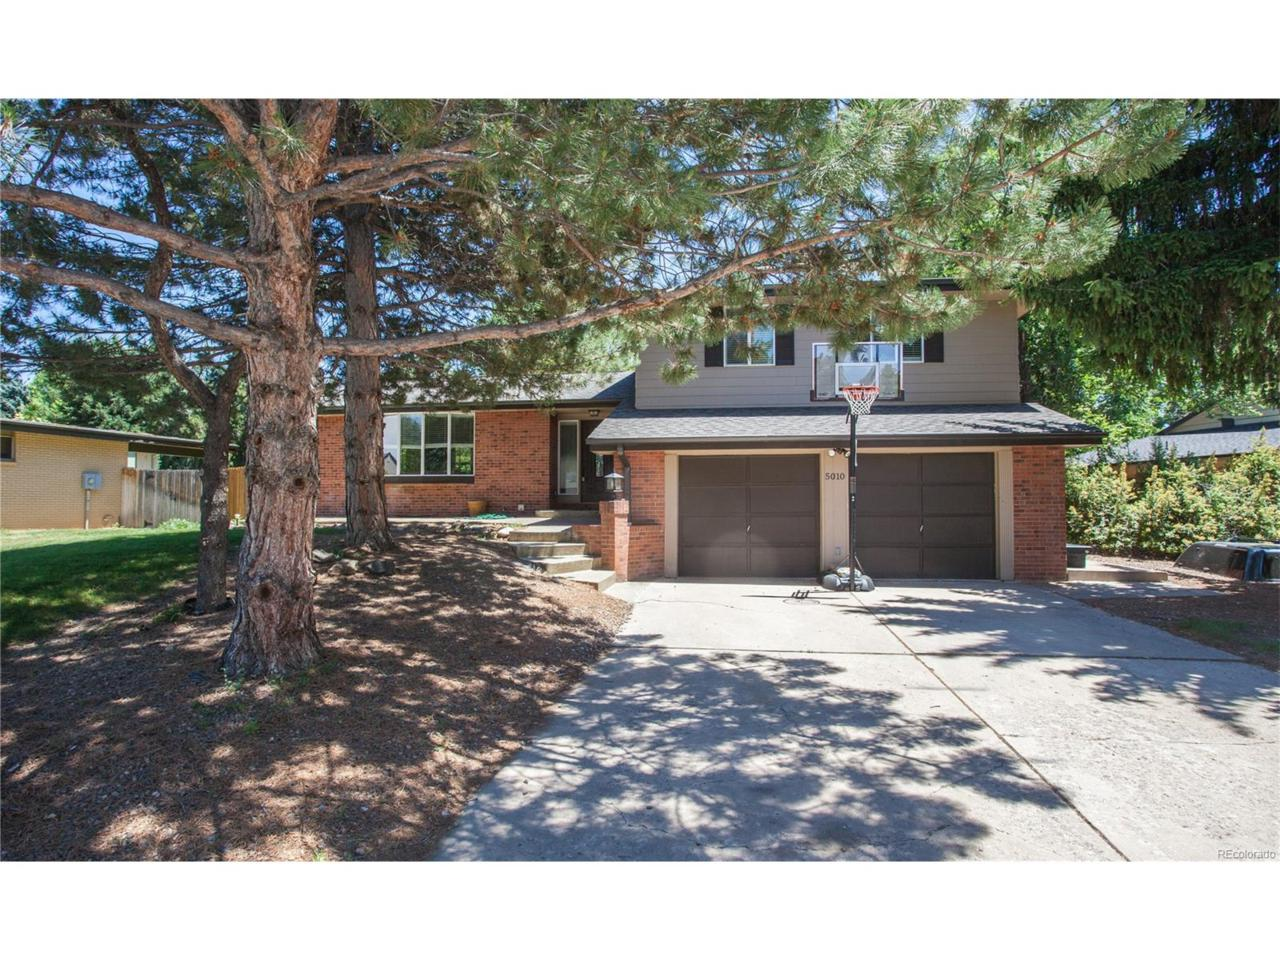 5010 S Beeler Street, Greenwood Village, CO 80111 (MLS #5956944) :: 8z Real Estate